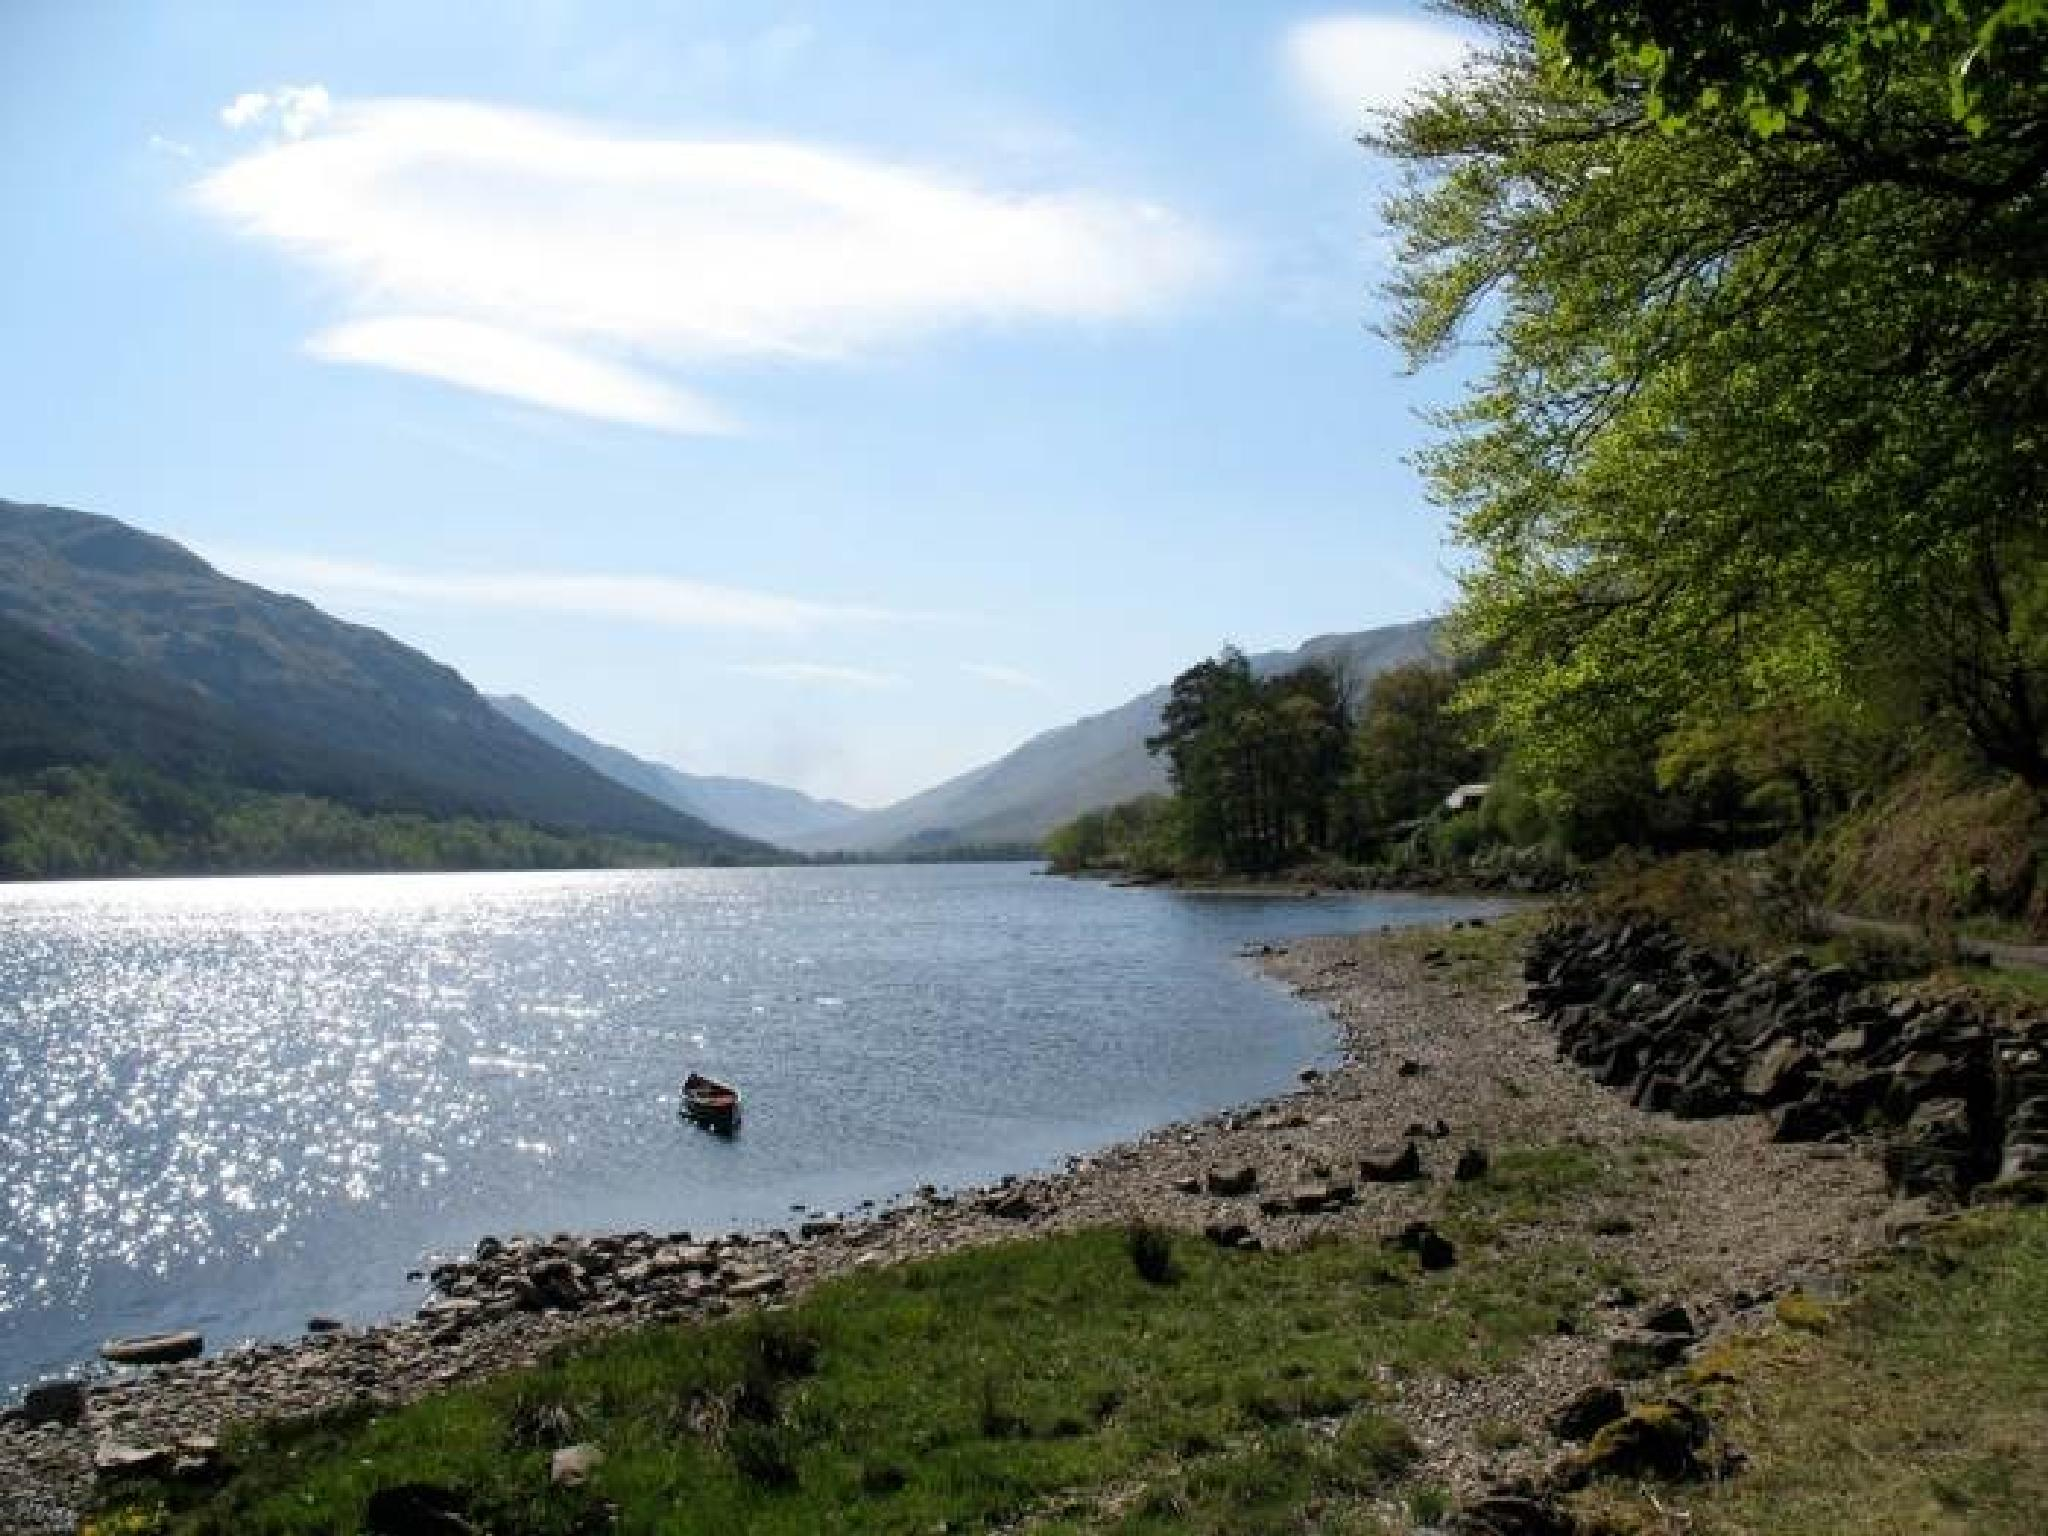 Perthshire, Scotland by riddelljane